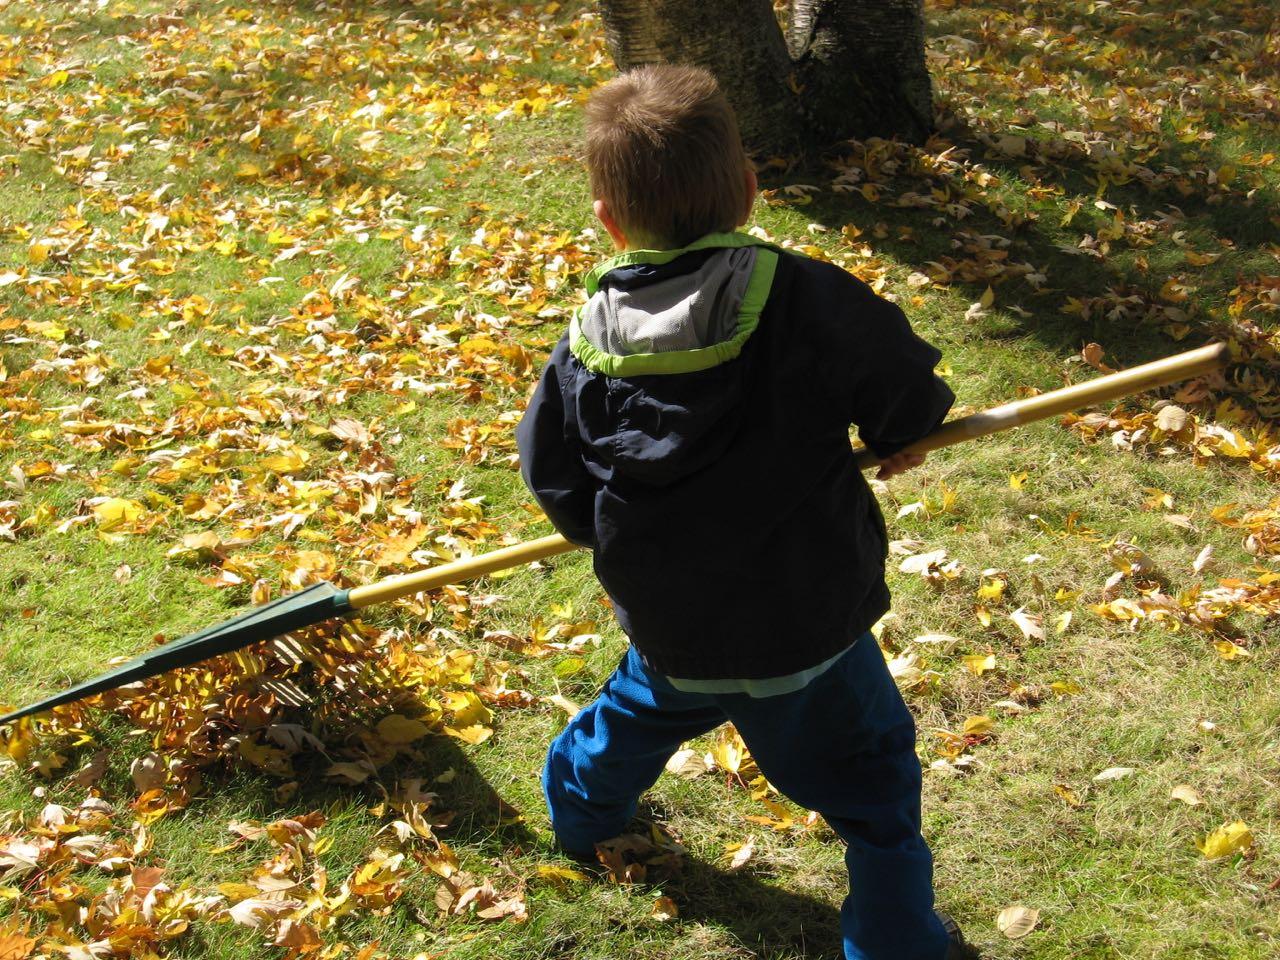 Fisher rakes